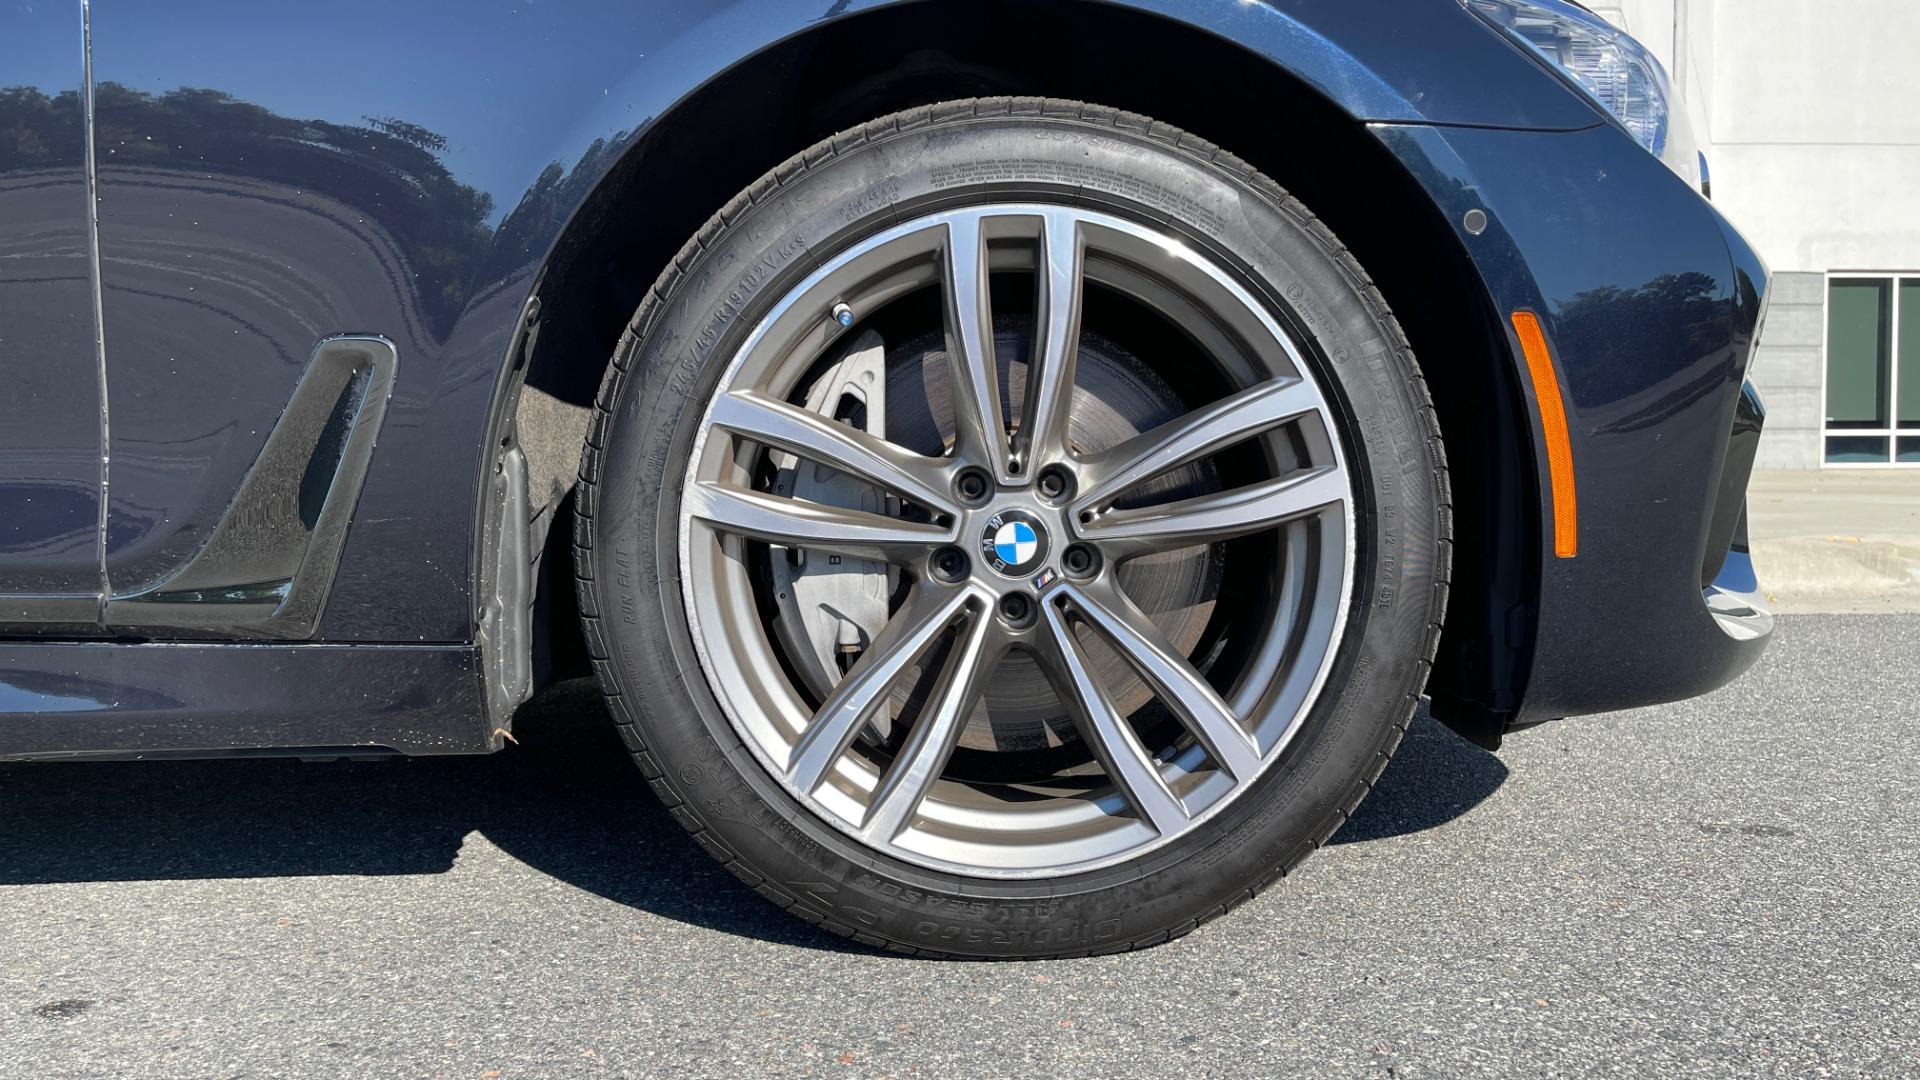 Used 2019 BMW 7 SERIES 750I XDRIVE M-SPORT / EXEC PKG / DRVR ASST PLUS / CLD WTHR / PAR for sale $60,995 at Formula Imports in Charlotte NC 28227 60